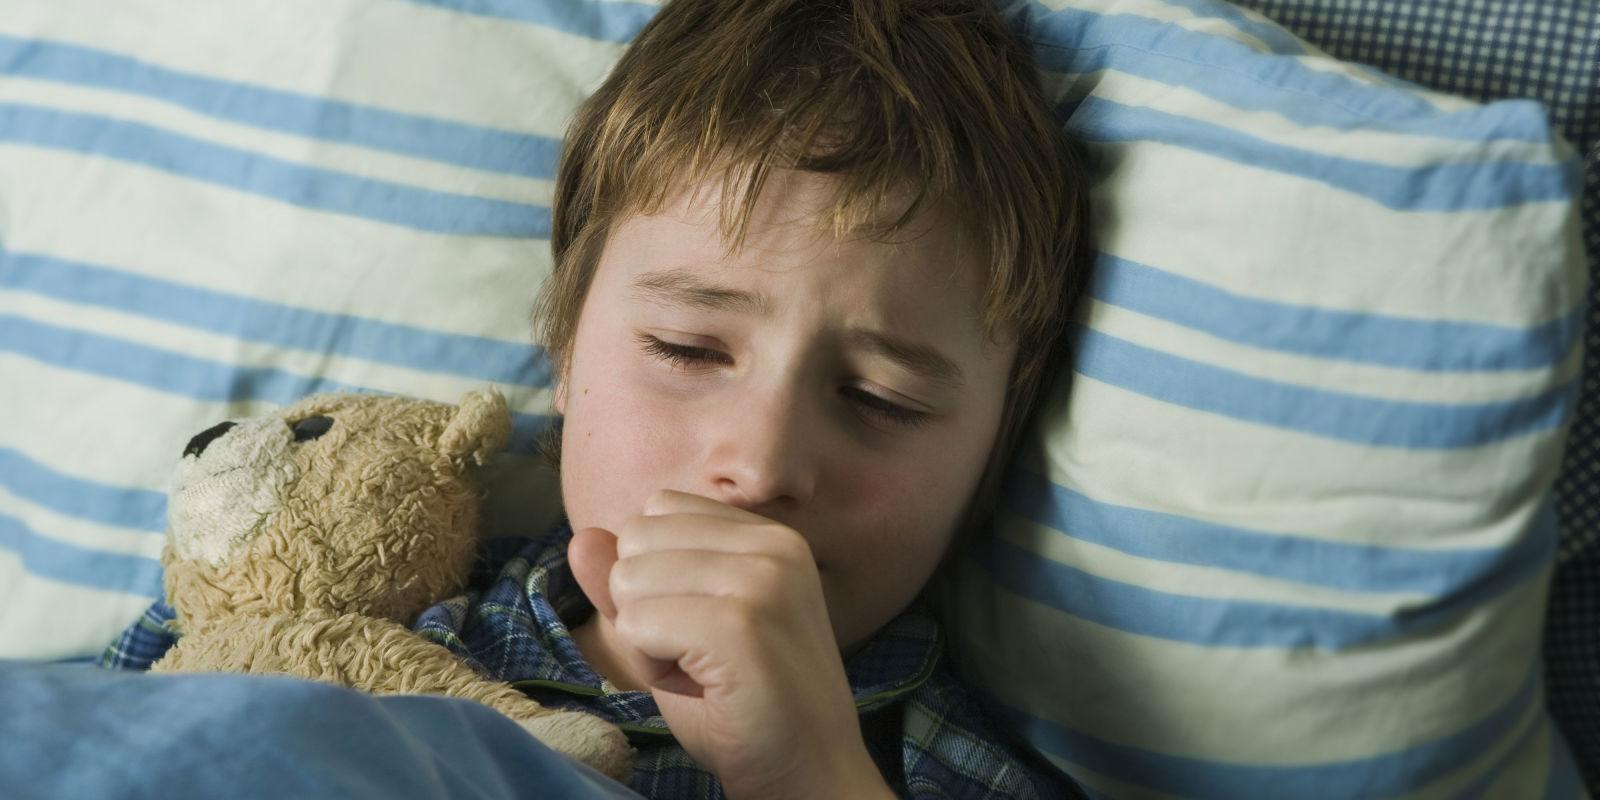 child-sick-used-4-pertussis-8674036medium